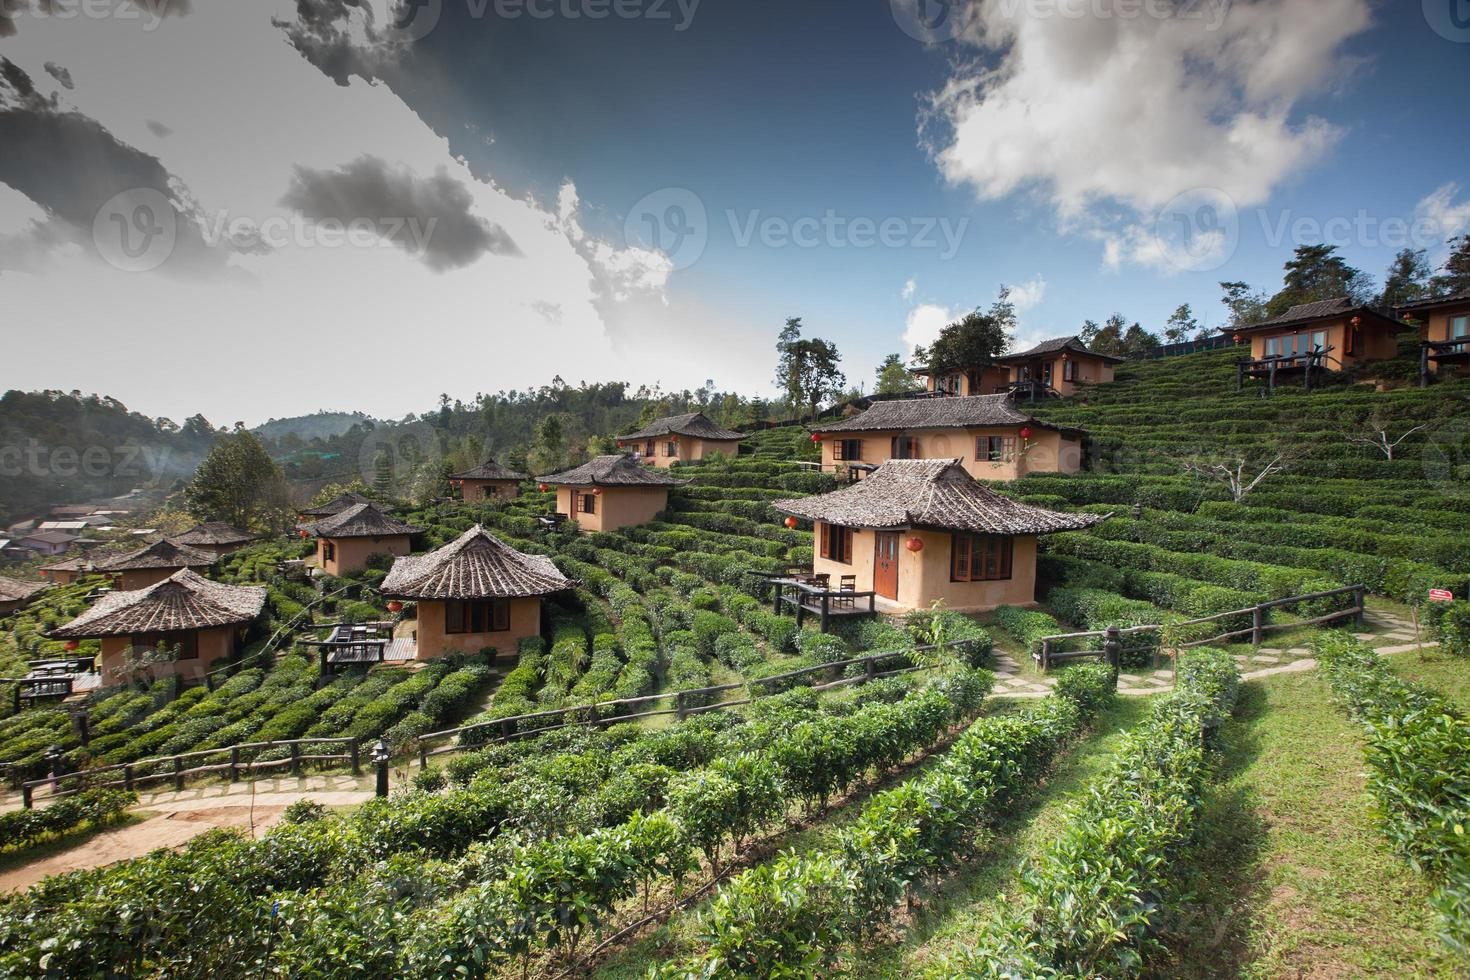 by och grönt te fält foto